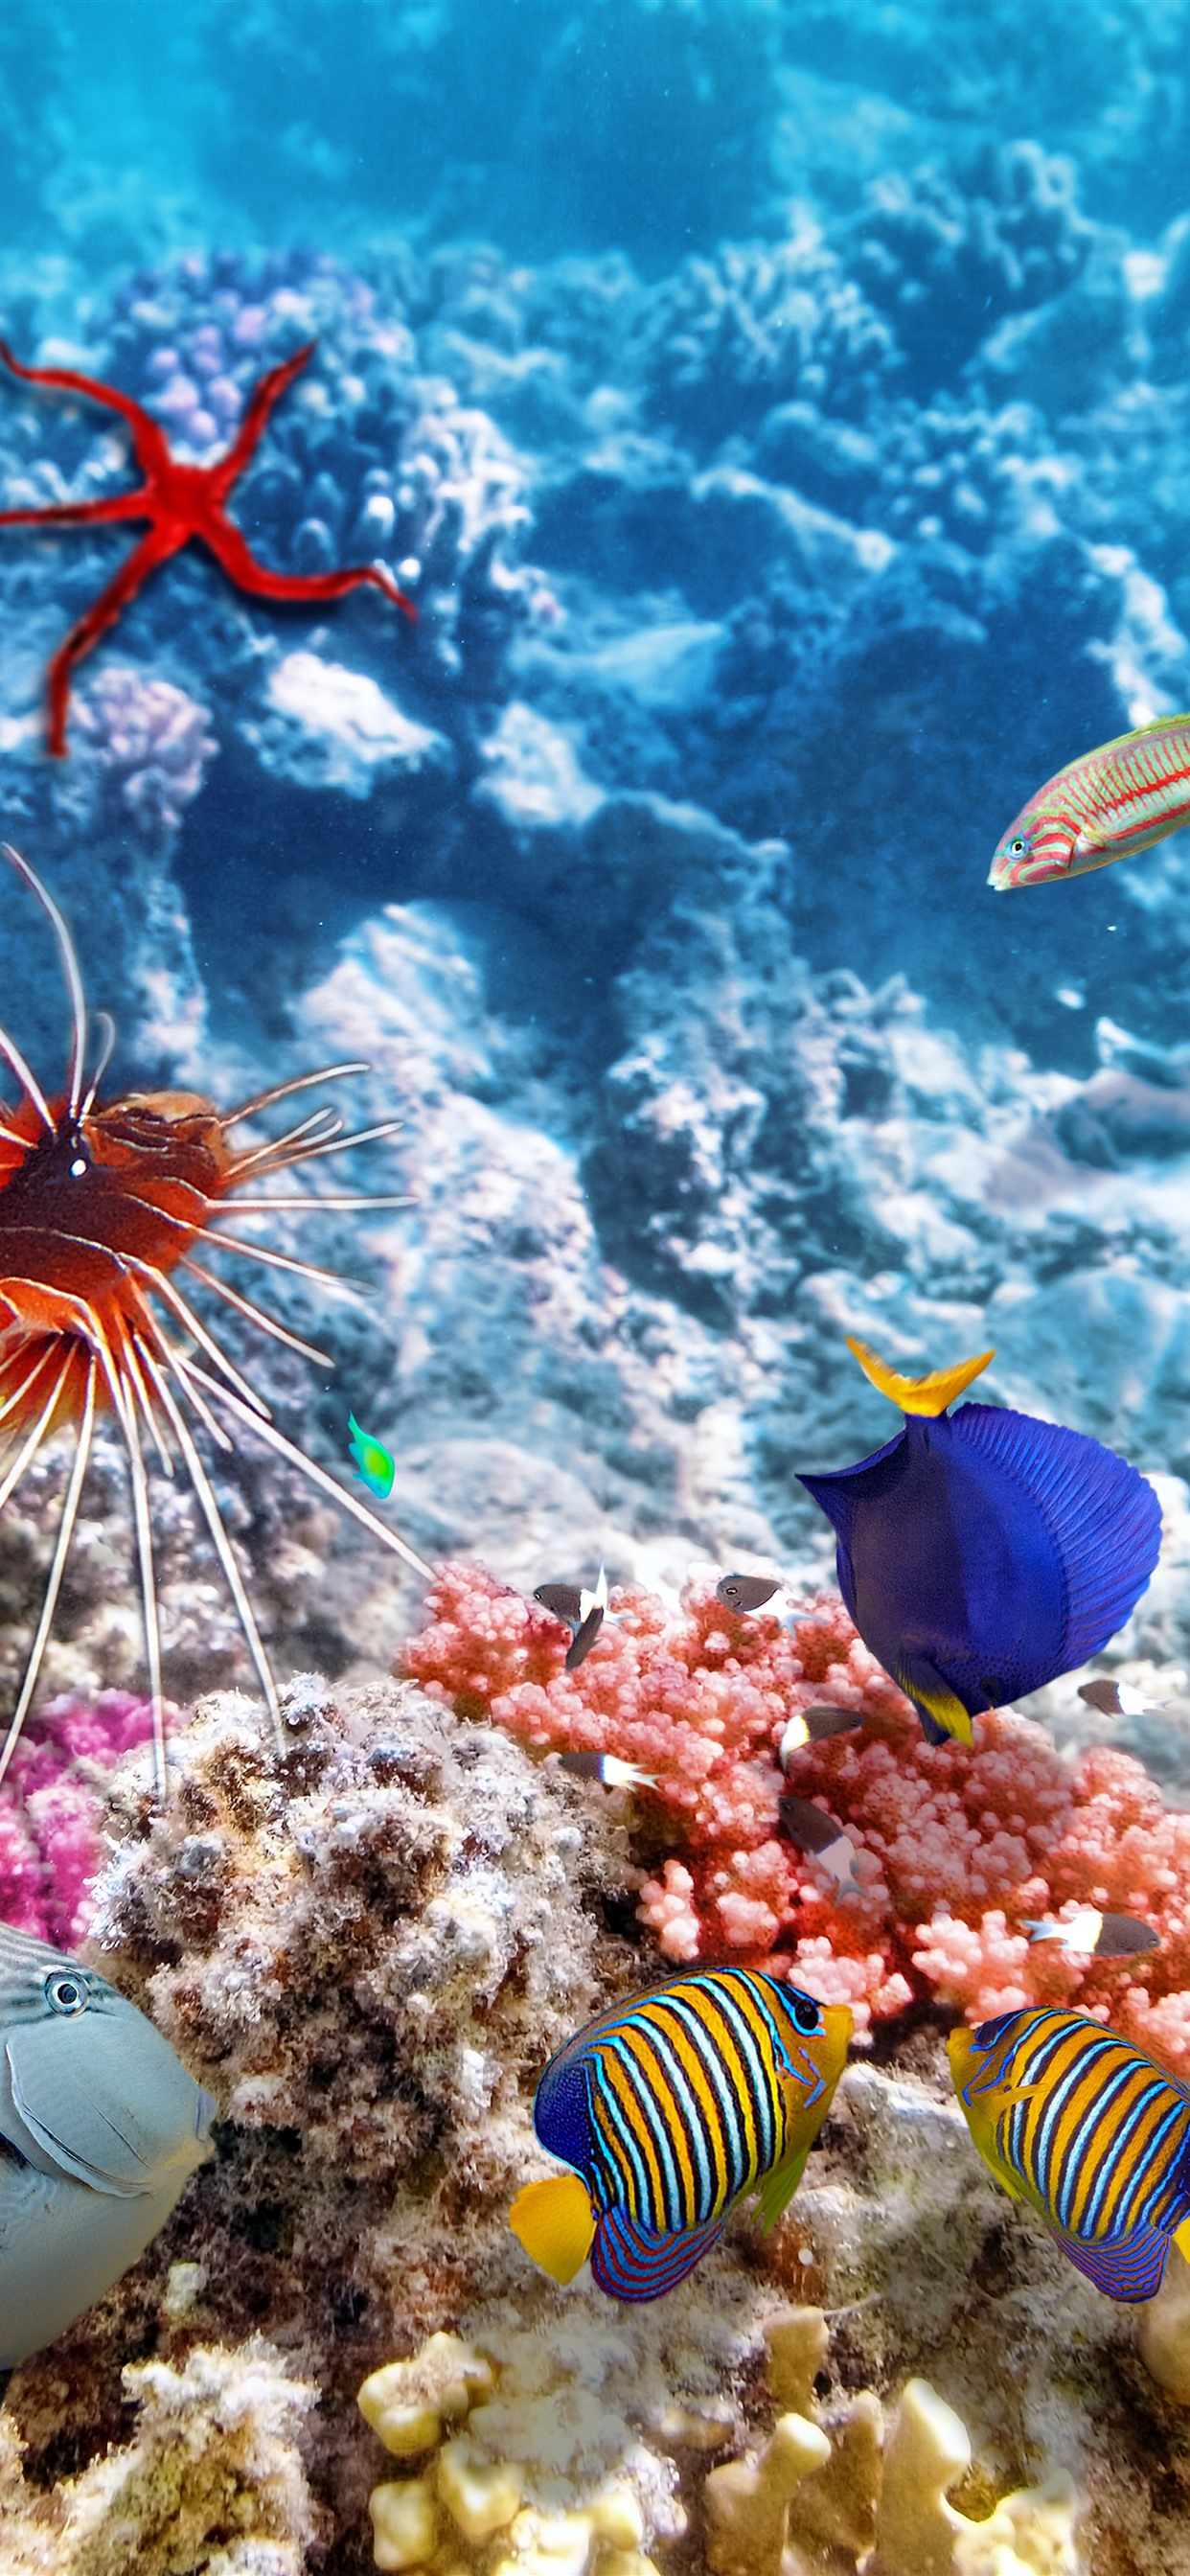 Colorful Fish Underwater Sea Clownfish 1242x2688 Iphone